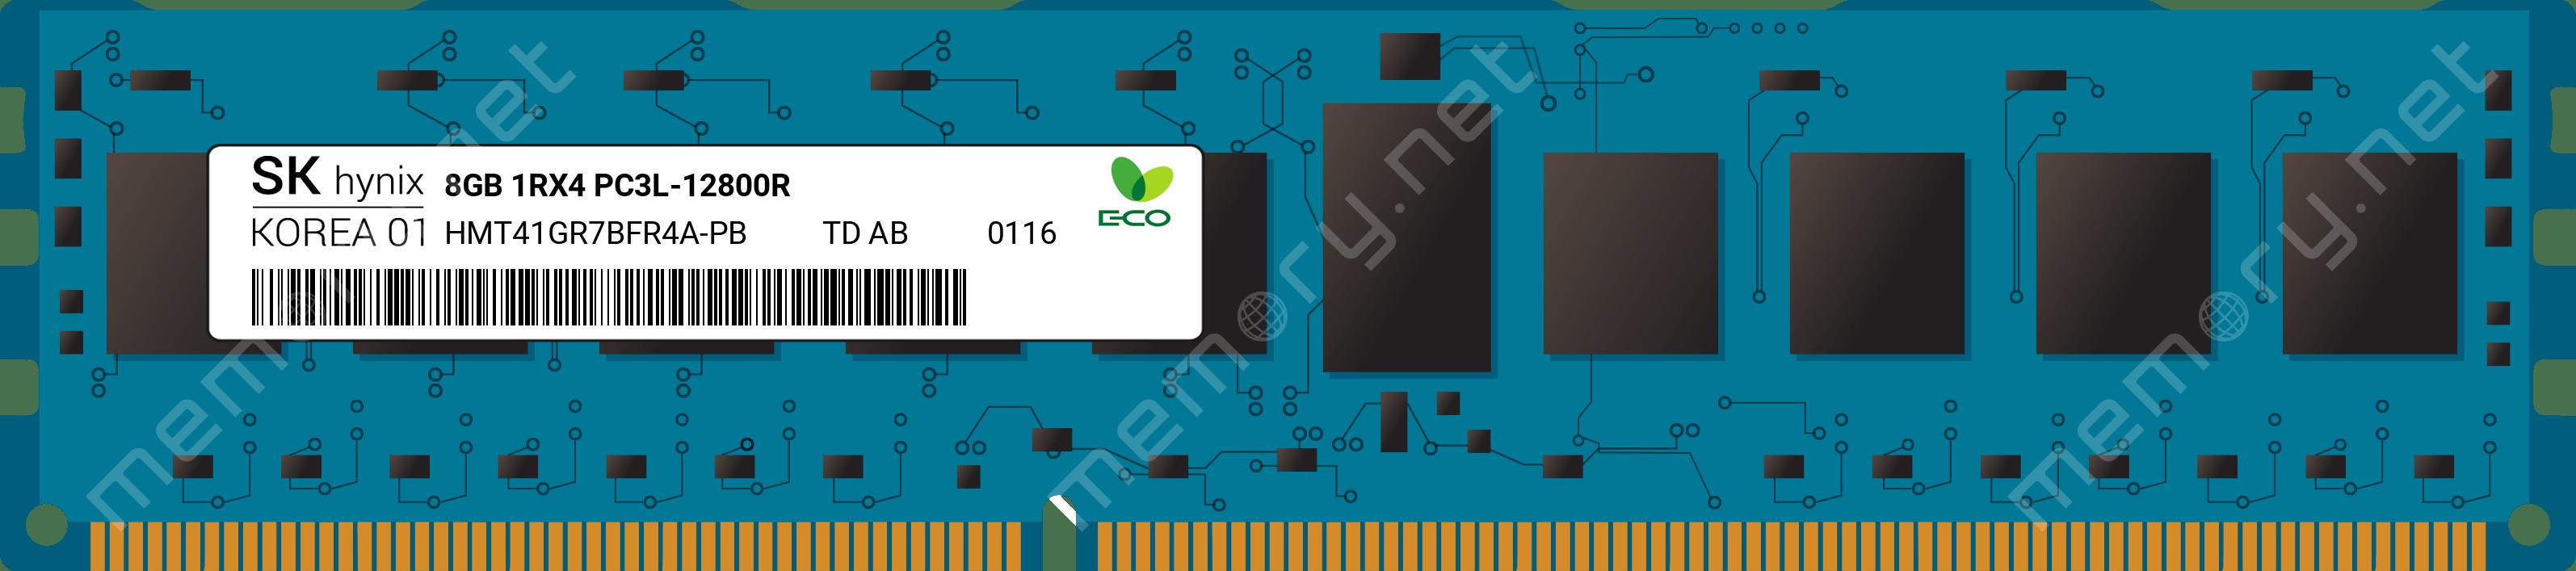 DELL HYNIX 8GB PC3L-12800R DDR3-1600 ECC REG SERVER MEMORY HMT41GR7BFR4A-PB ****